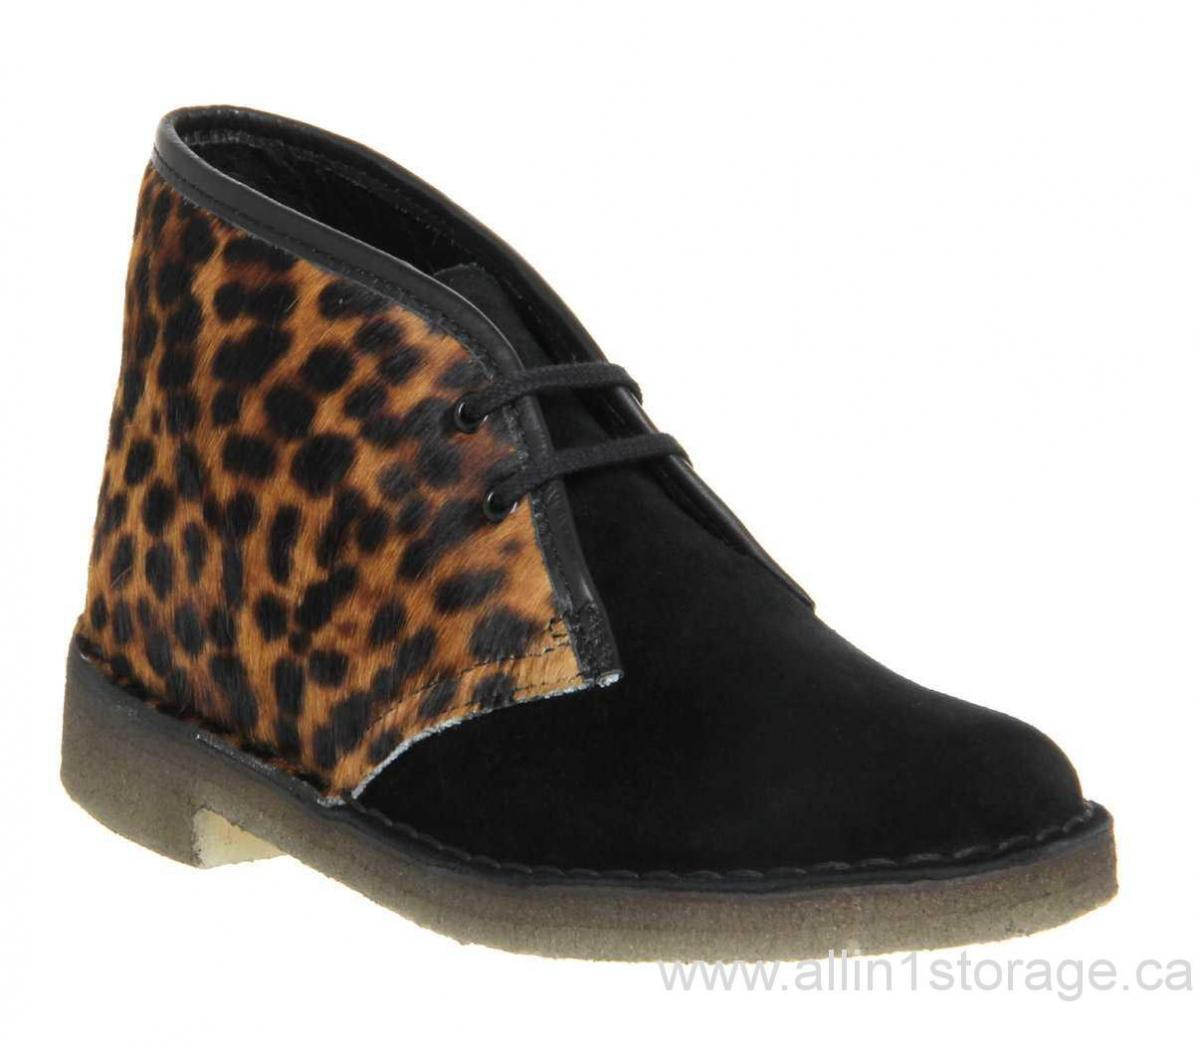 Clarks Originals mujer  Desert bota Animal Leopard Print  UK 3.4,5,6,7,8 C